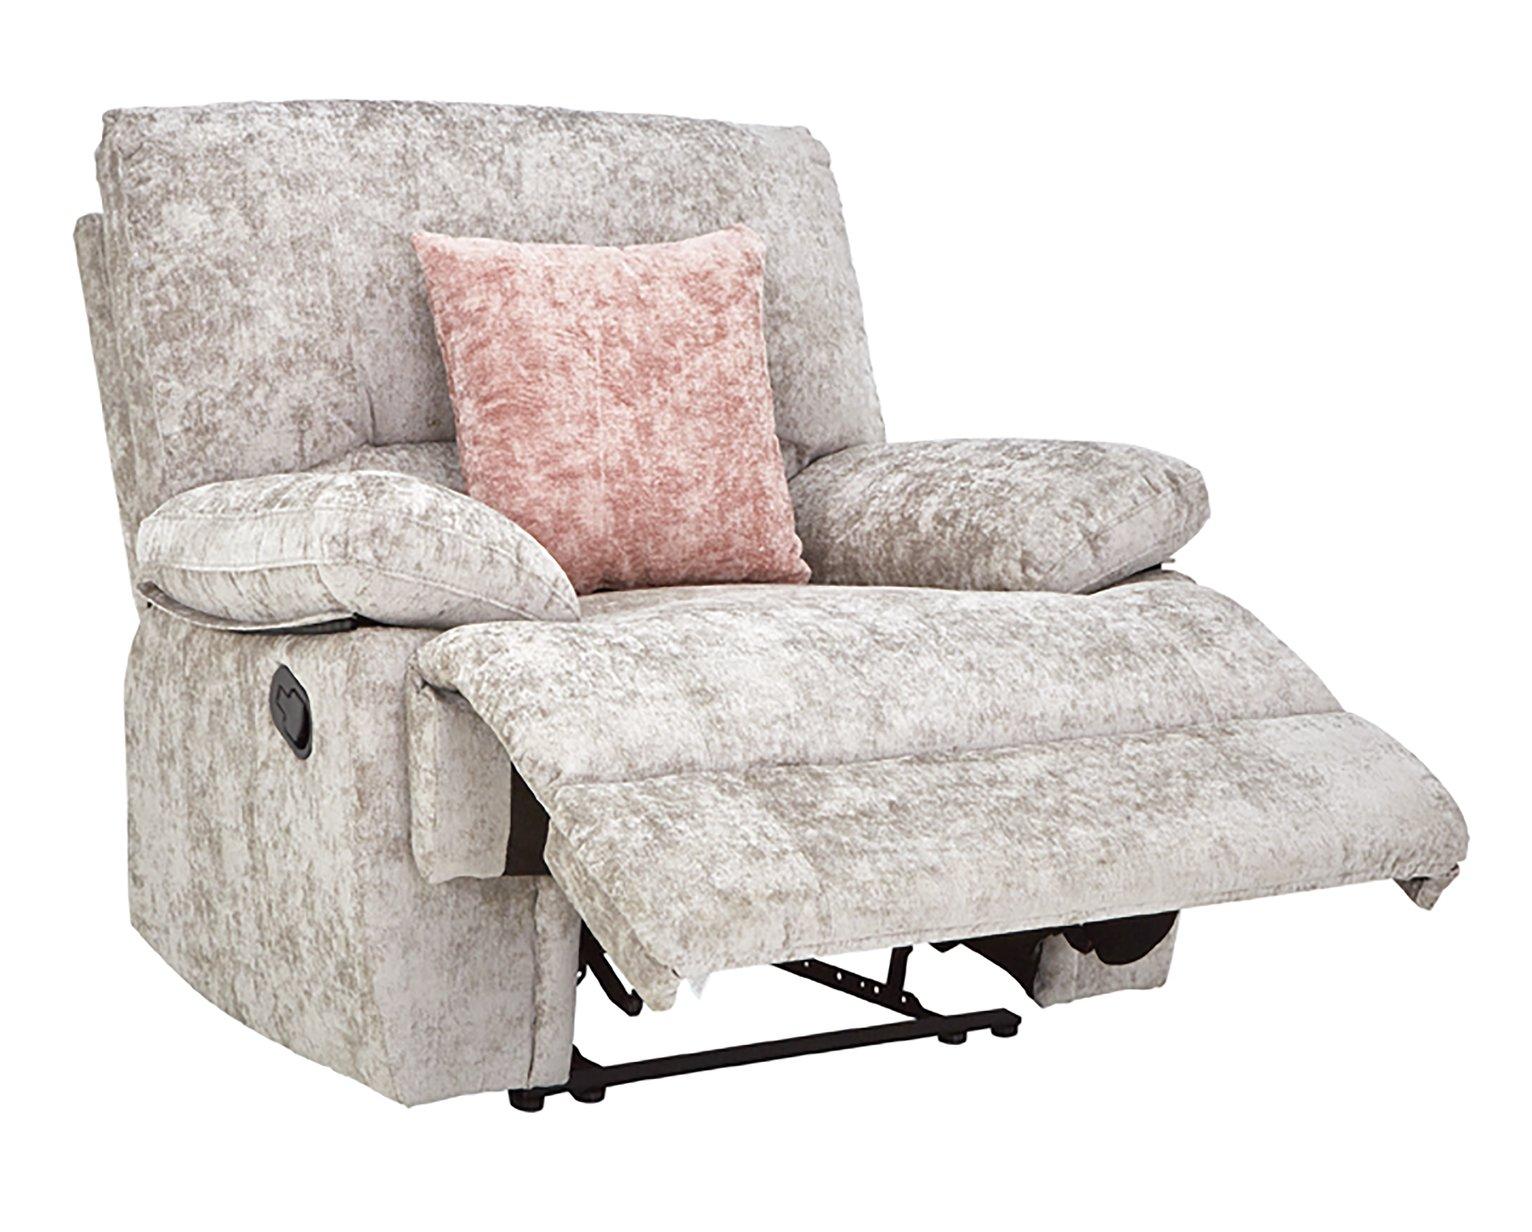 Carmilla Fabric Manual Recliner Chair - Silver - £181.95 Delivered @ Argos